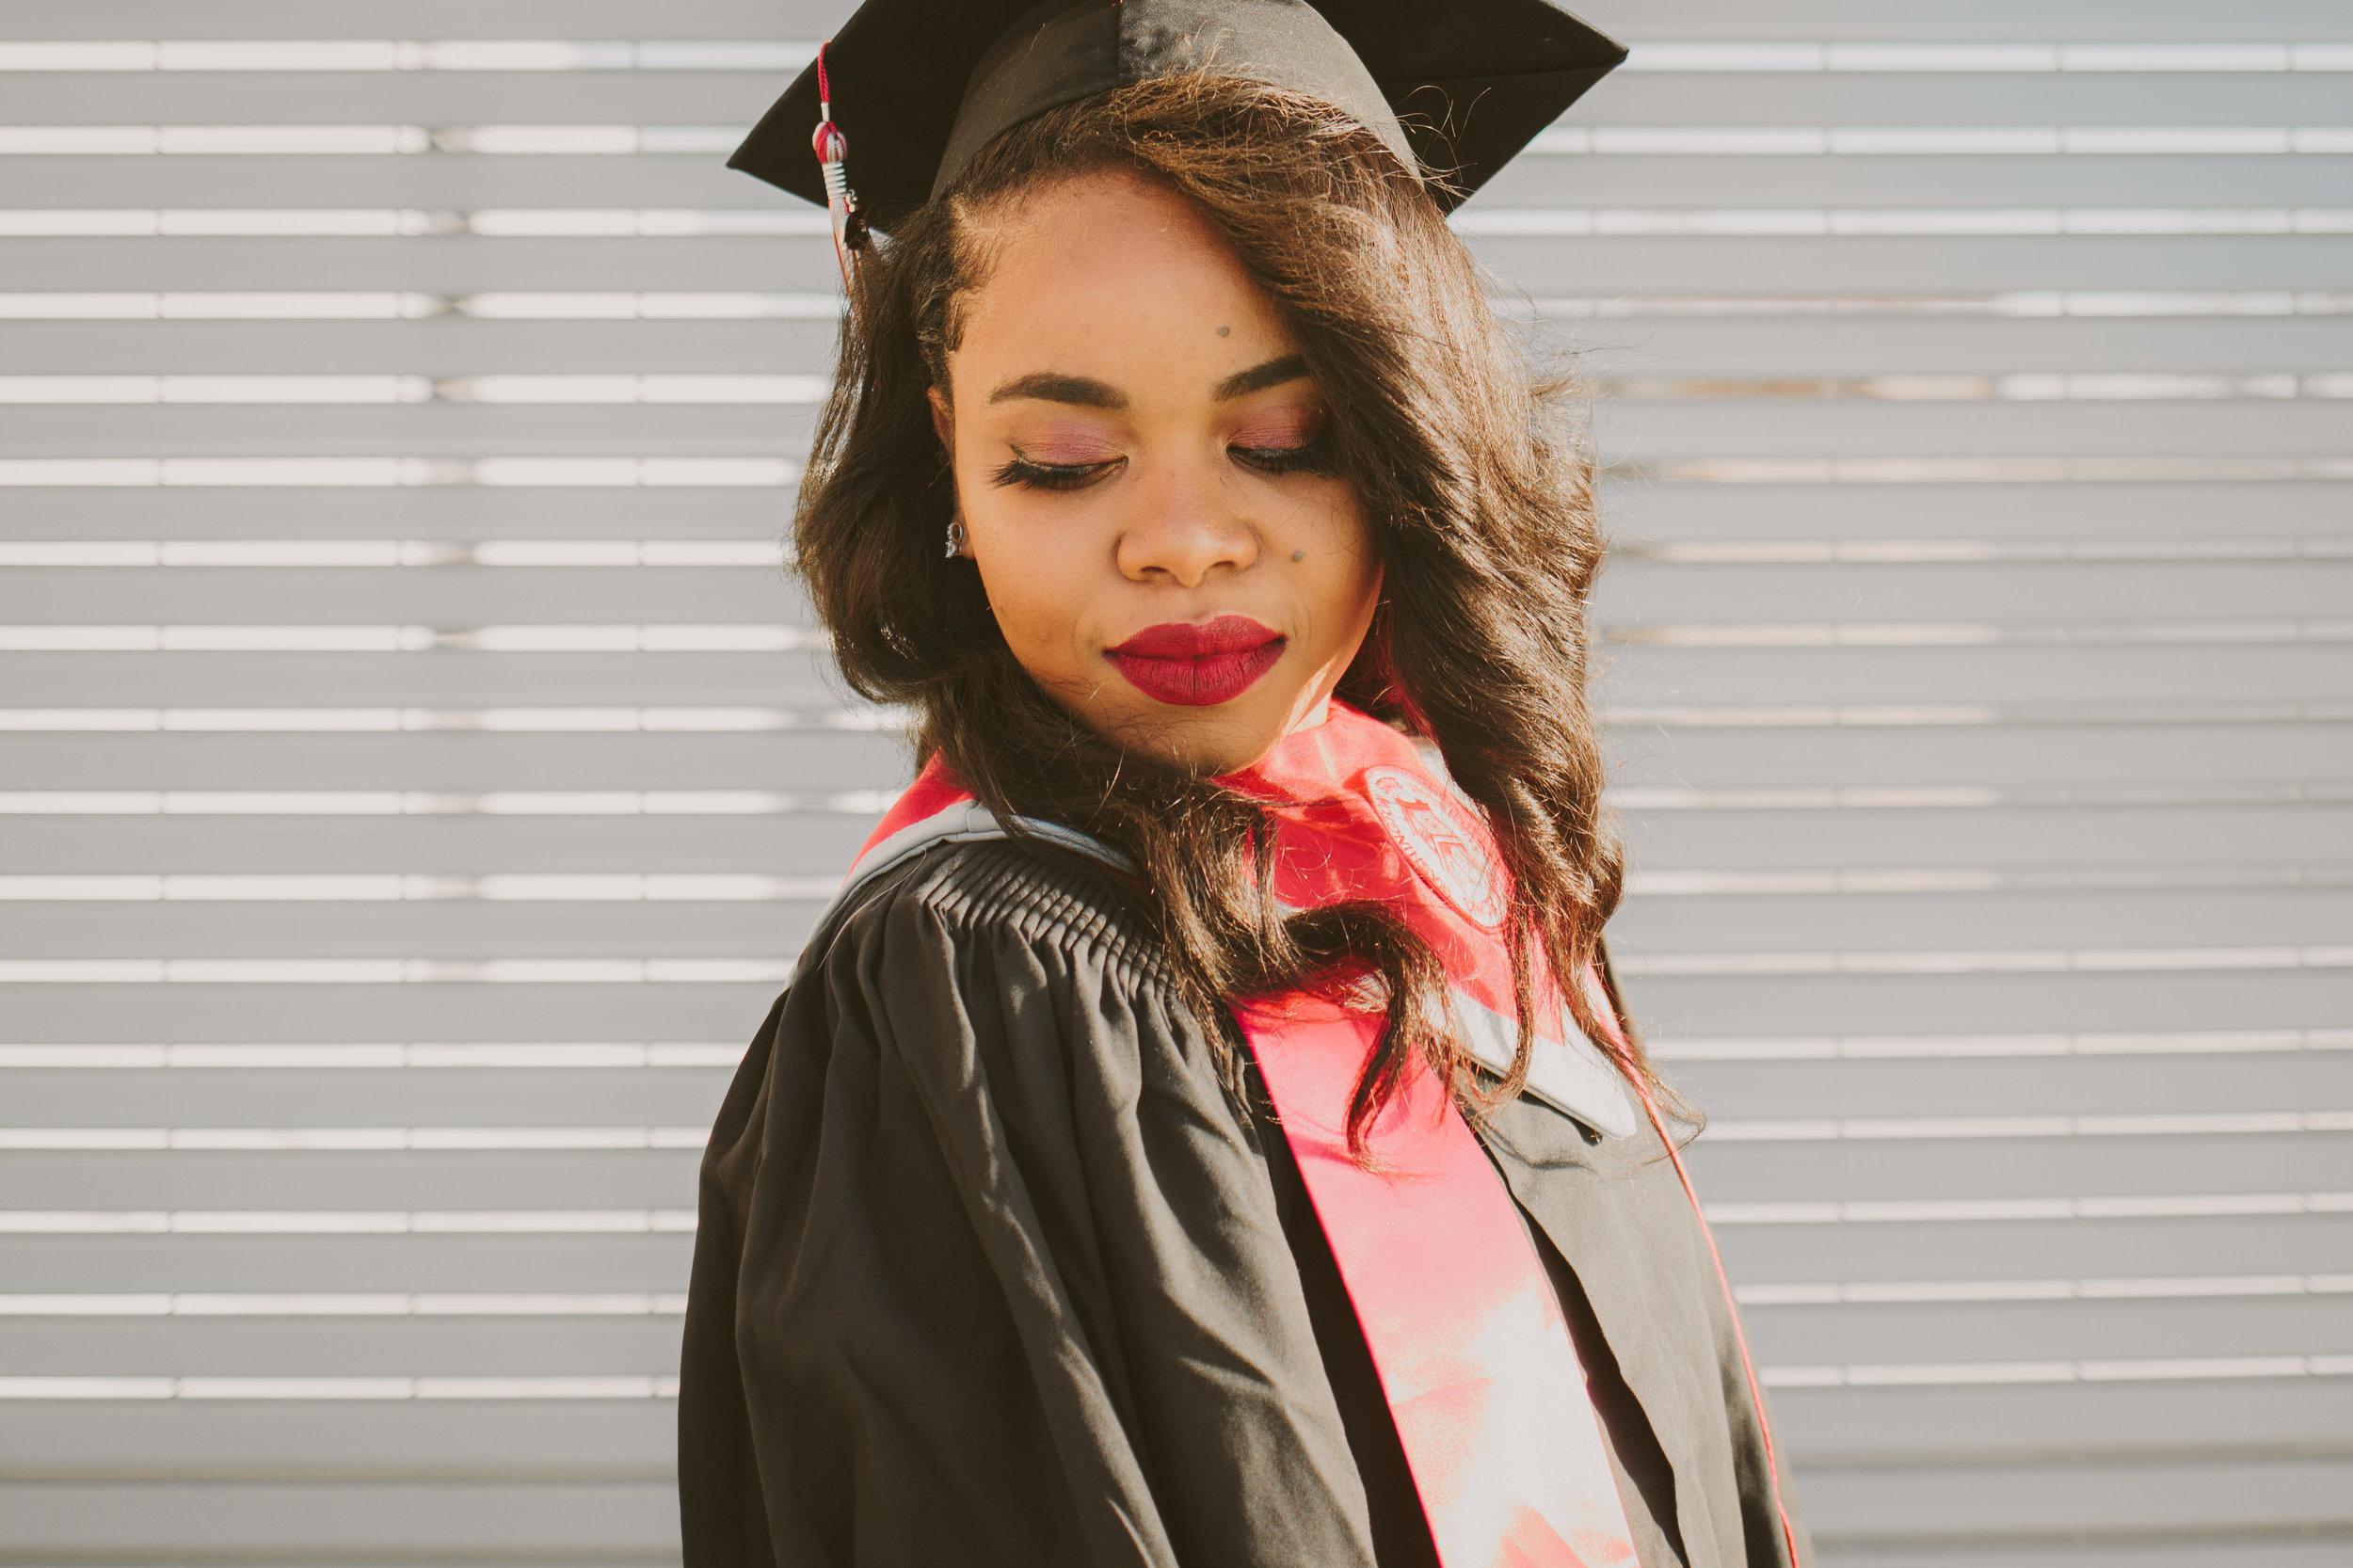 Ana_graduation-39.jpg